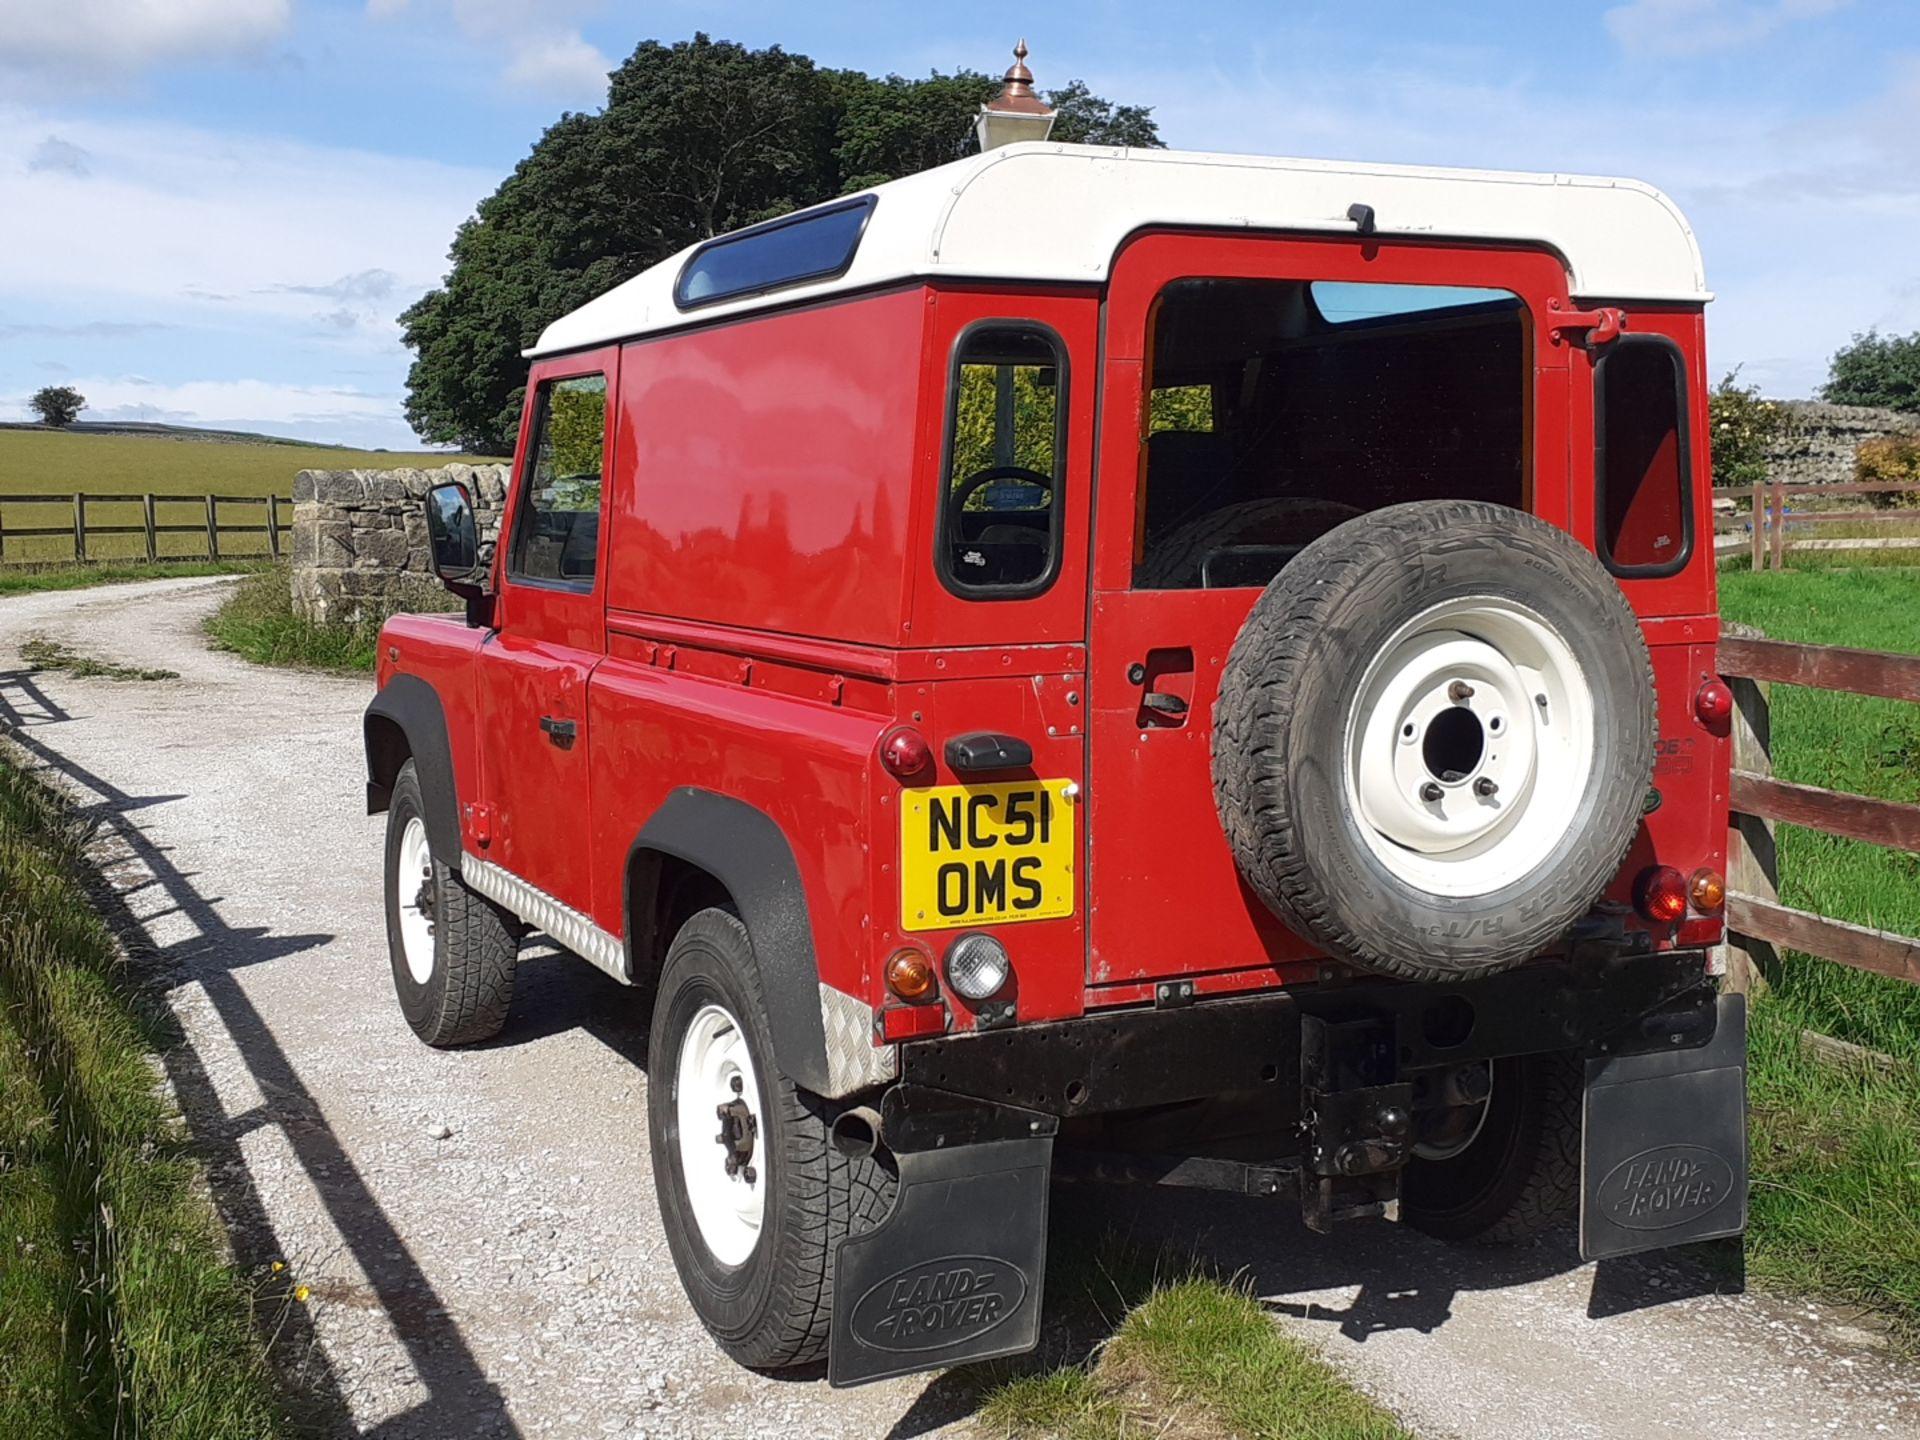 2002/51 REG LAND ROVER DEFENDER 90 PICK-UP TD5 RED 2.5 DIESEL 130 BHP, SHOWING 2 FORMER KEEPERS - Image 6 of 14